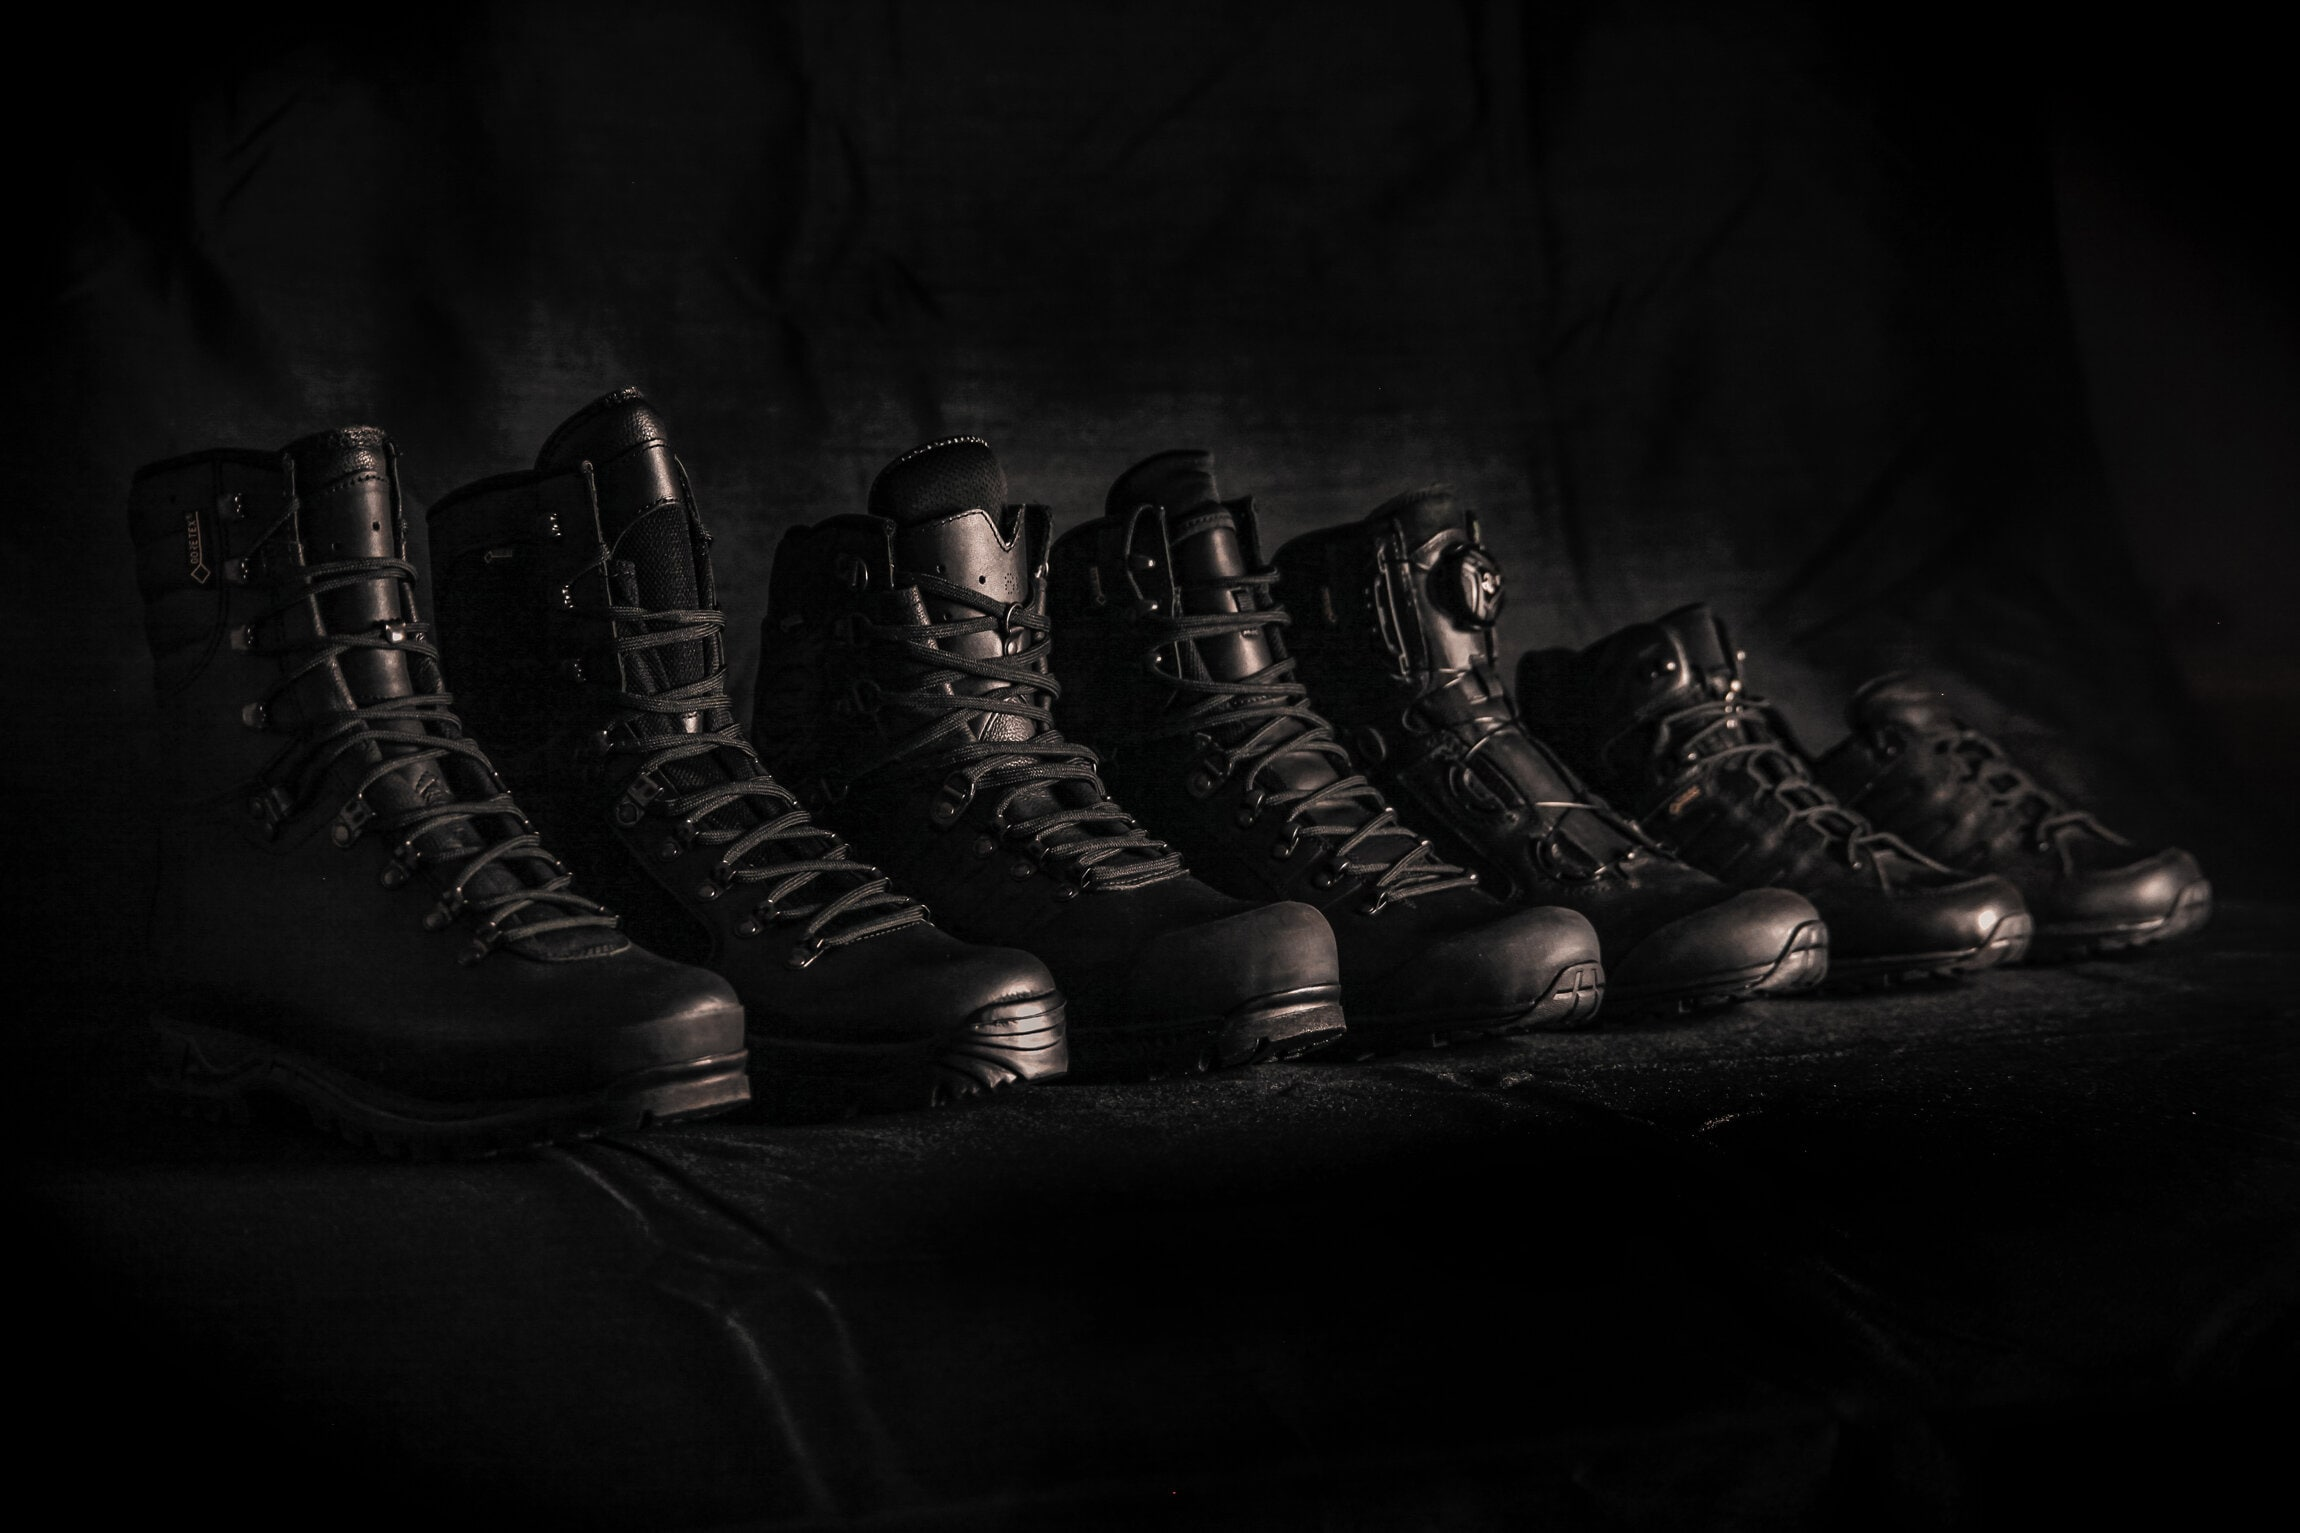 https://www.meindl.se/pub_docs/files/Startsidaförflight/Meindl-black-boot-collektion-svarta-skor-kangor-uniform-yrke-.jpg